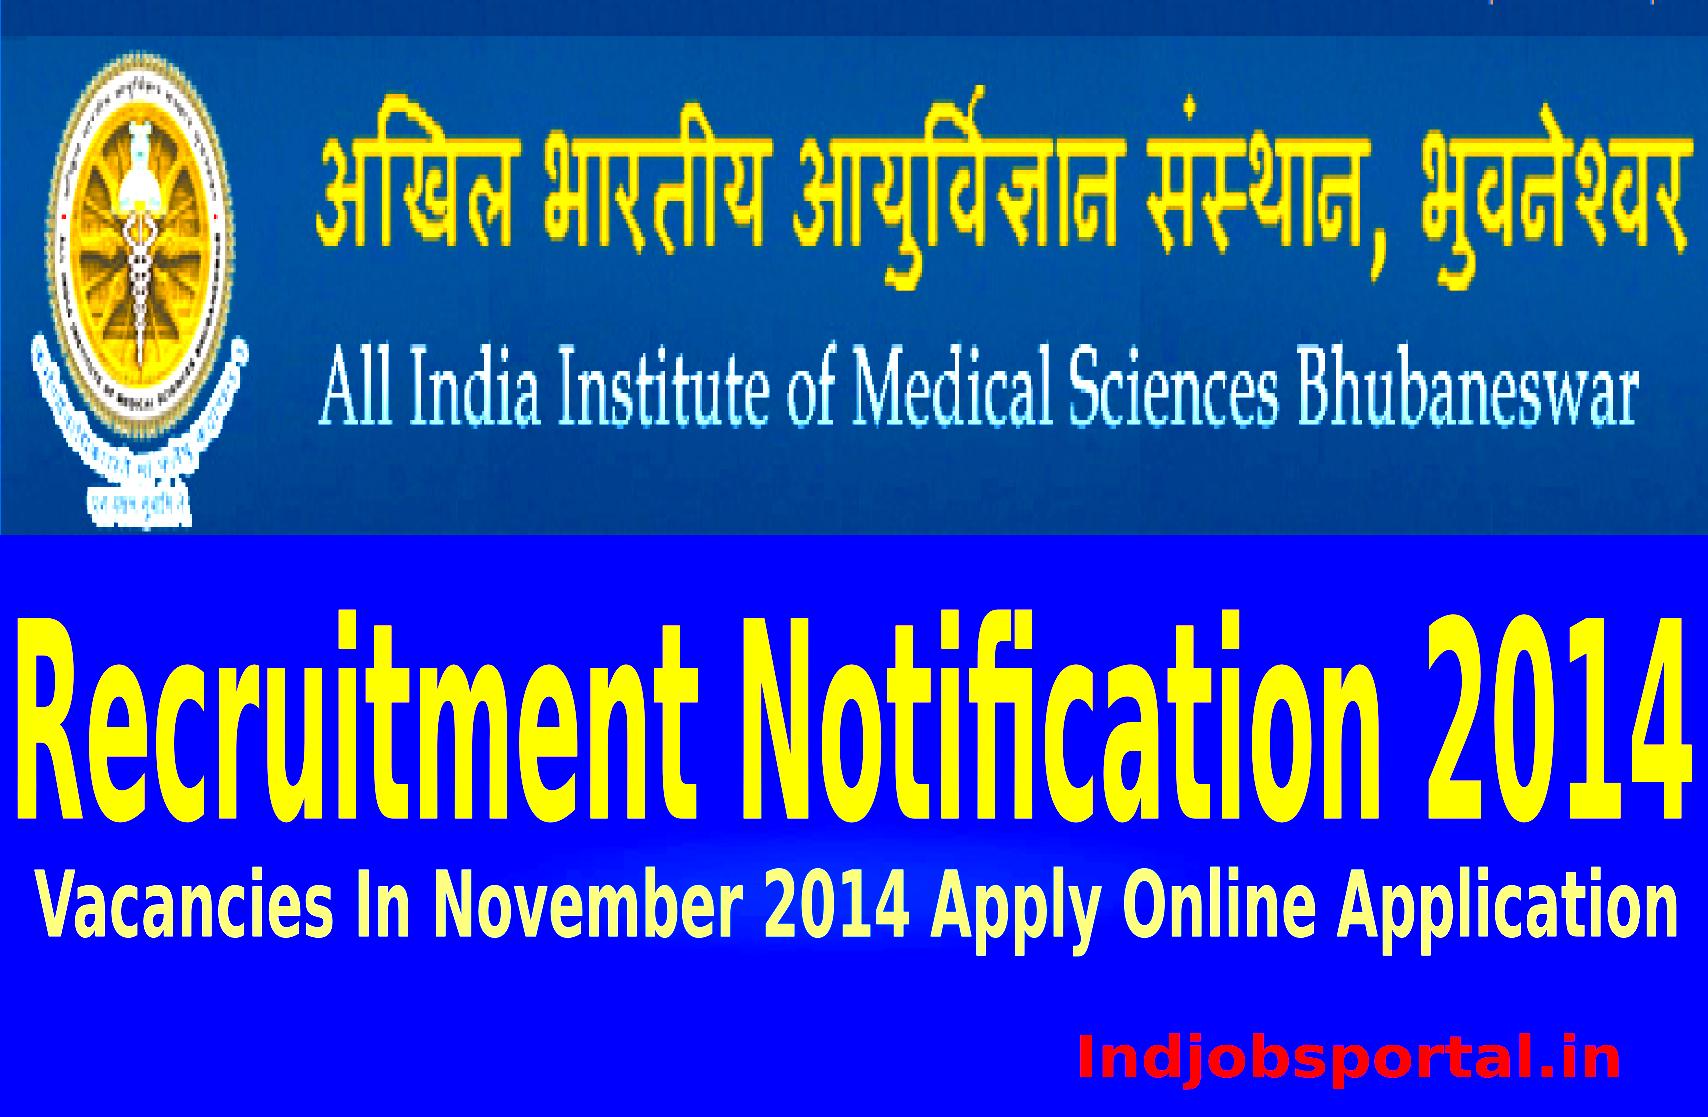 AIIMS Recruitments 201